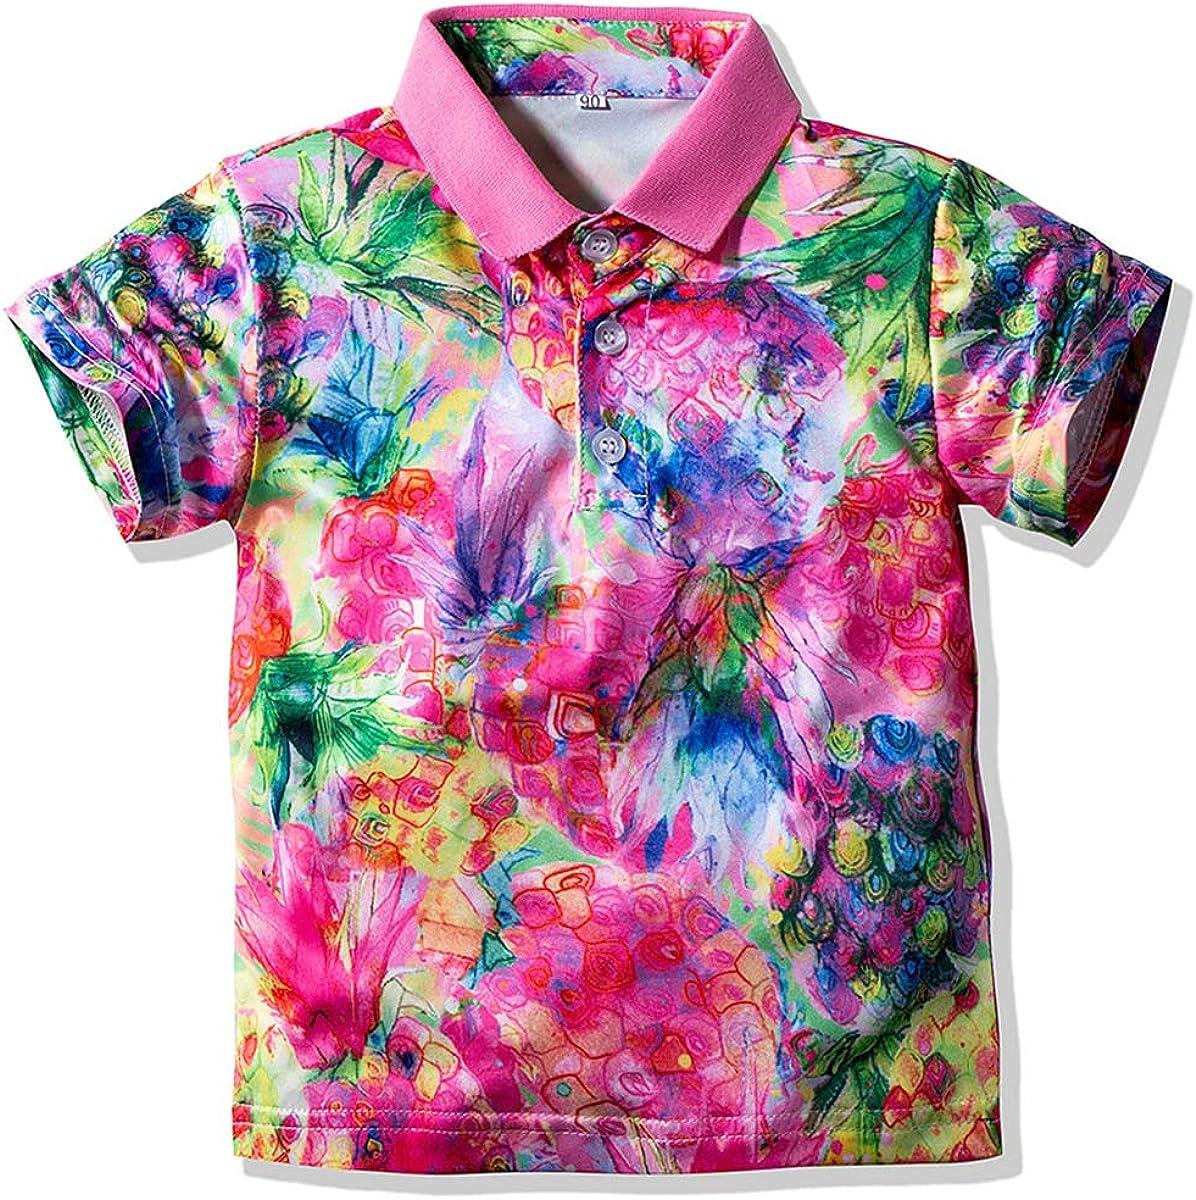 Mubineo Toddler Little Boy Summer Coloful Short Sleeve Cotton Polo Shirt Tops